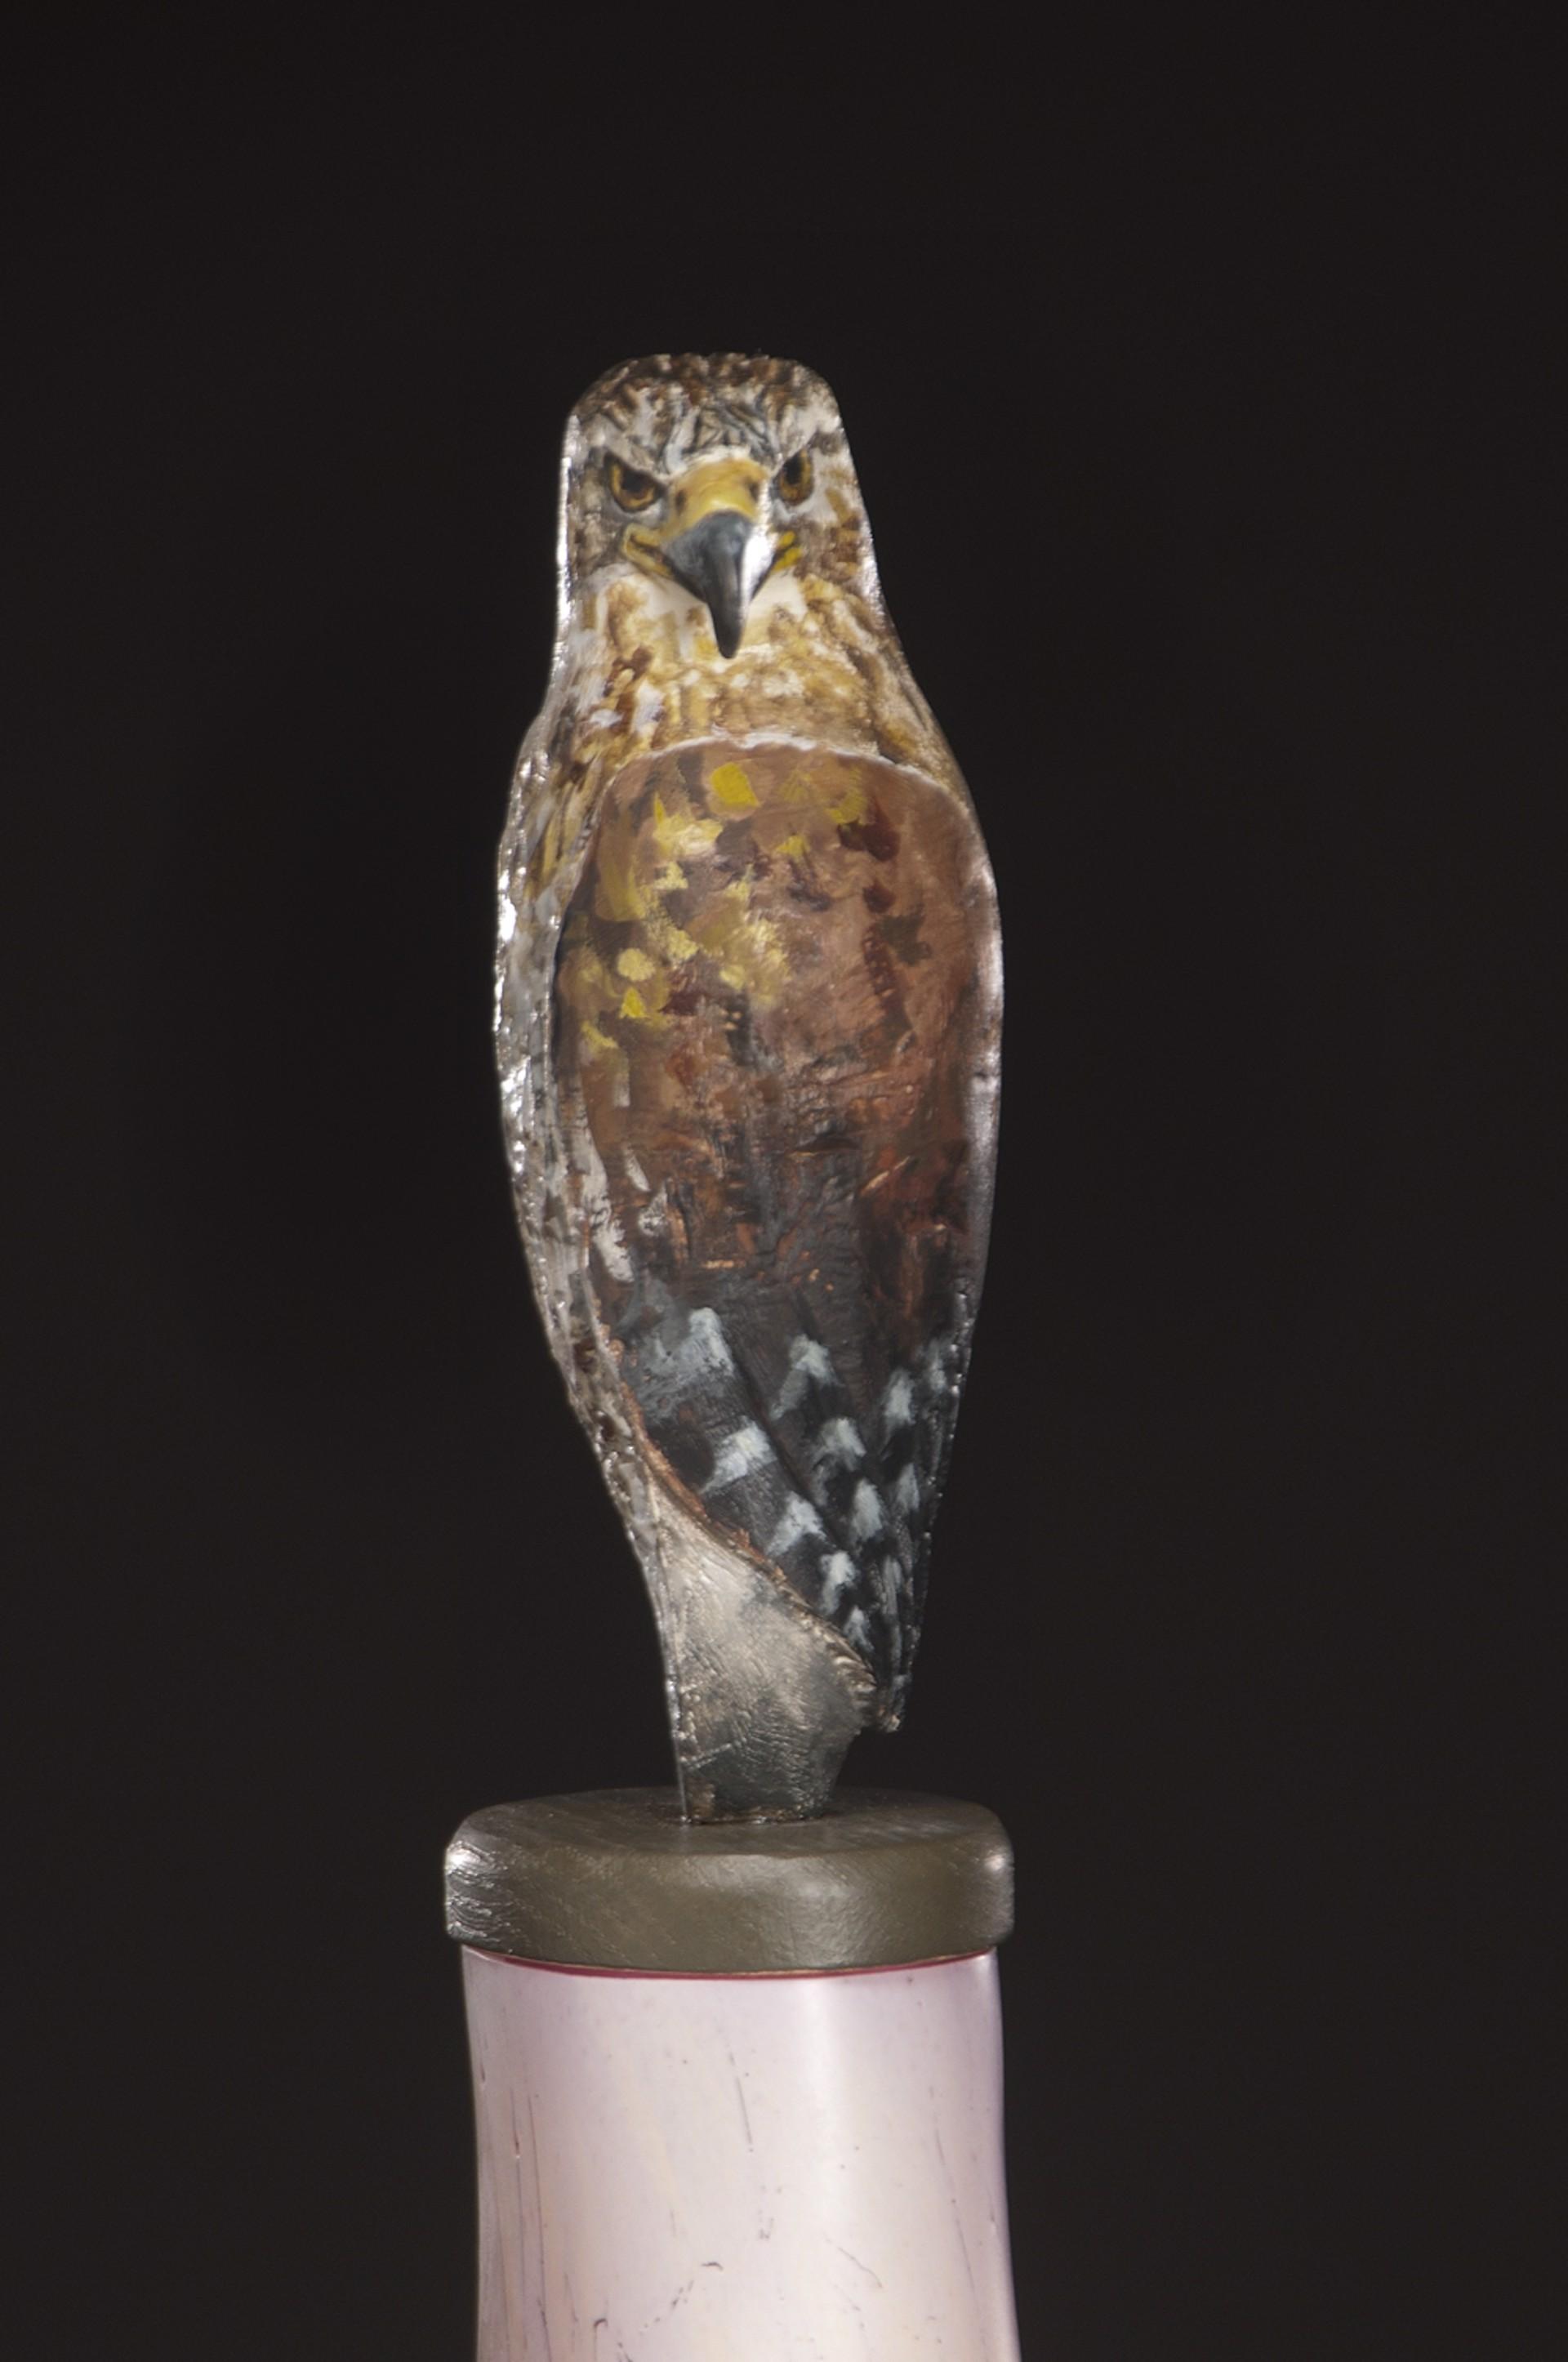 Hawk Spirit Jar by Peter Wright